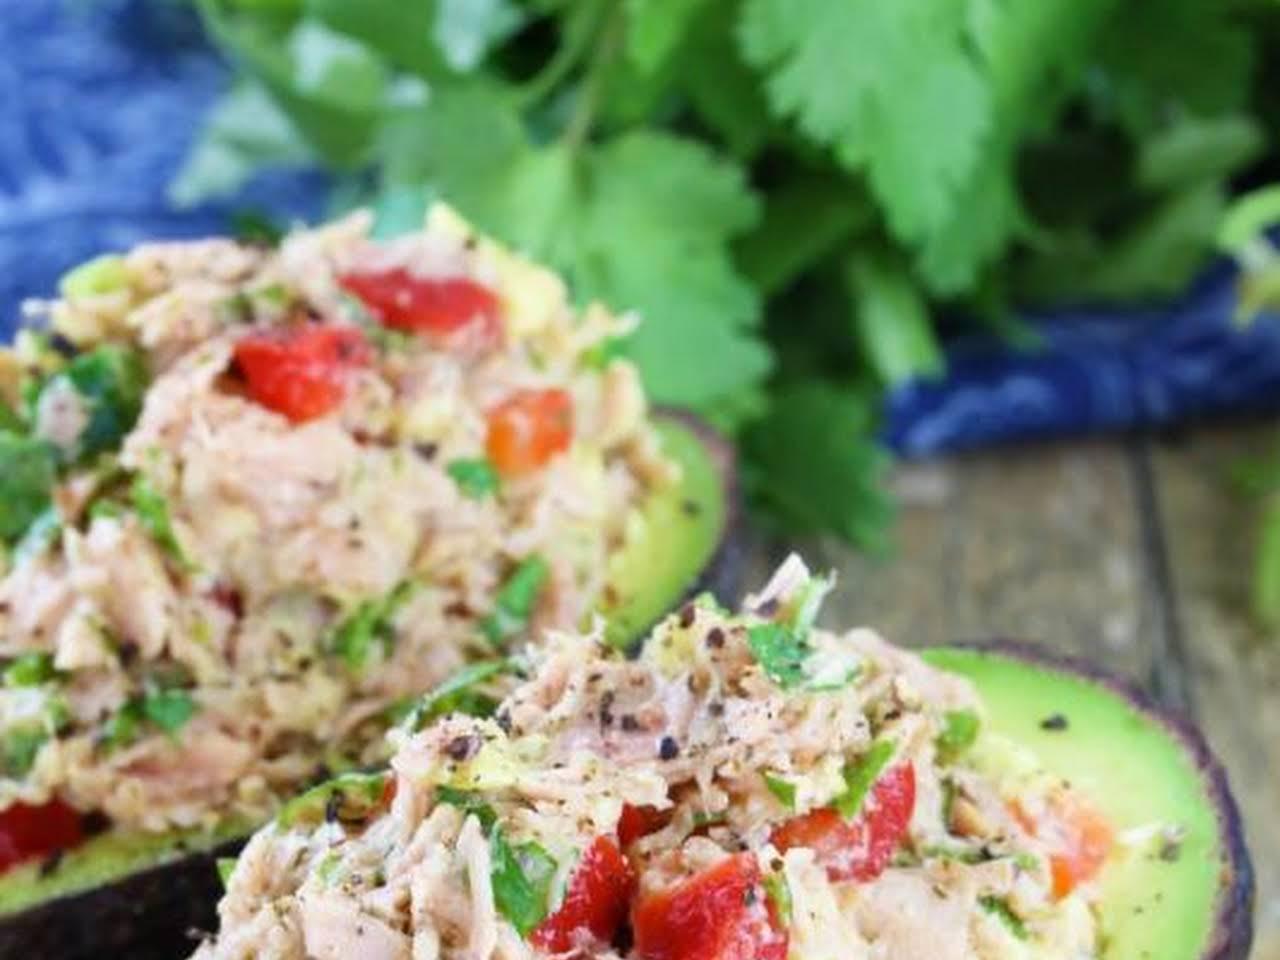 10 Best Microwave Tuna Recipes